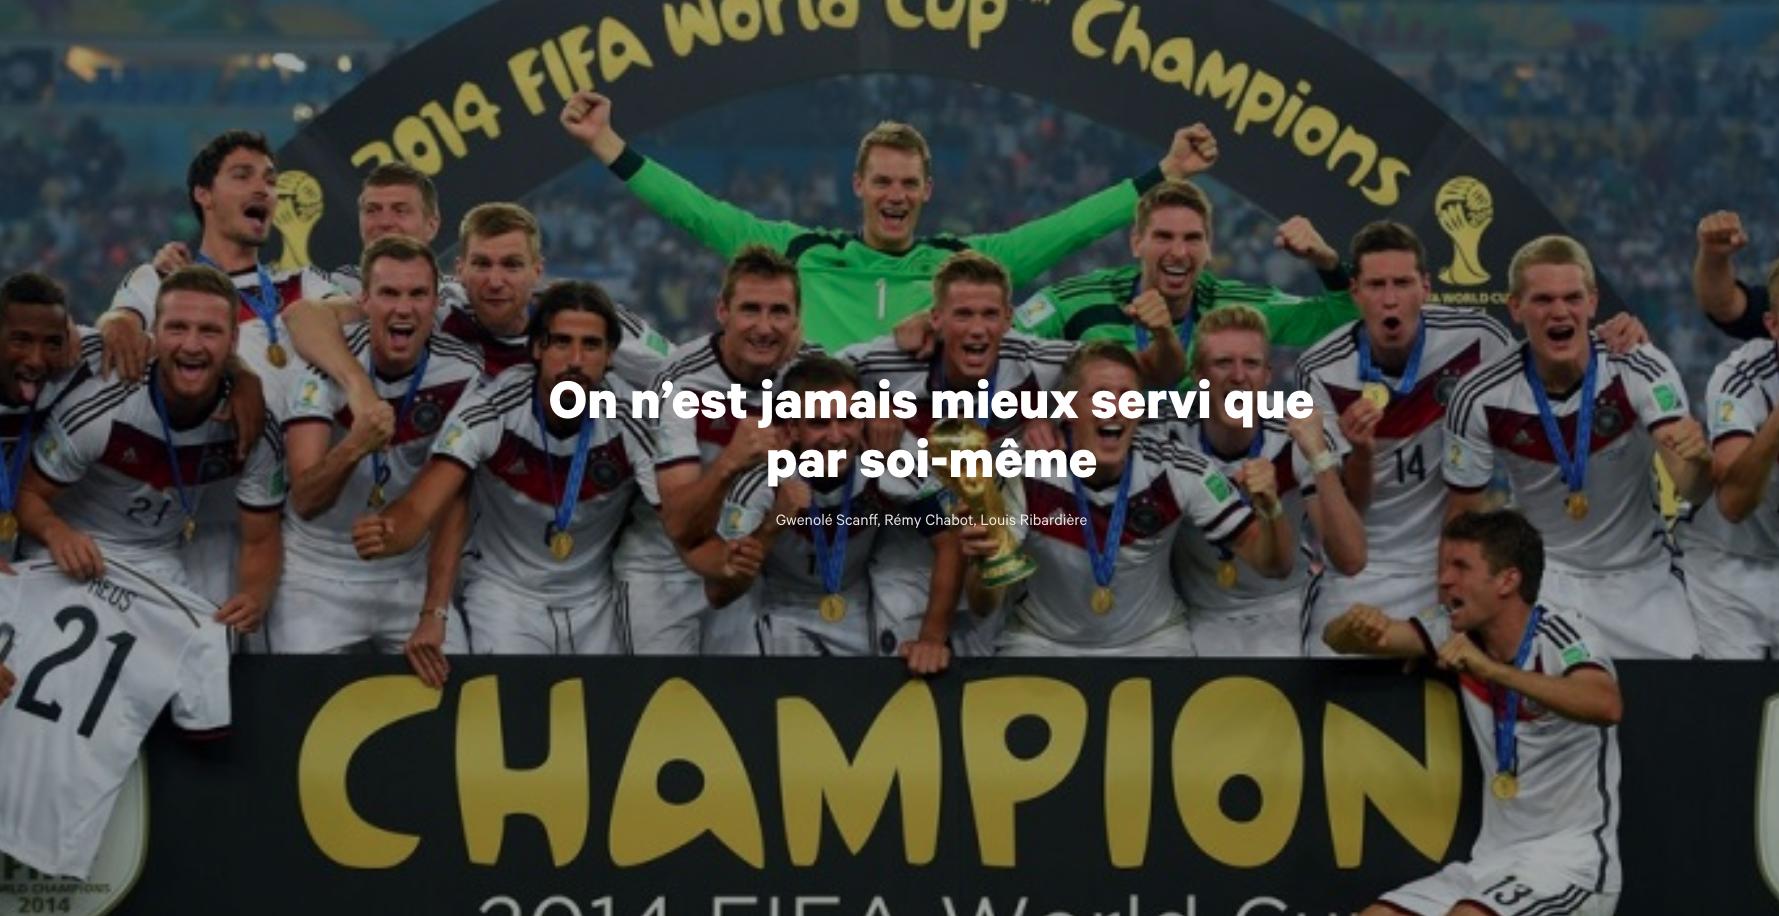 Ecole de journalisme EFJ : Initiation au journalisme sportif